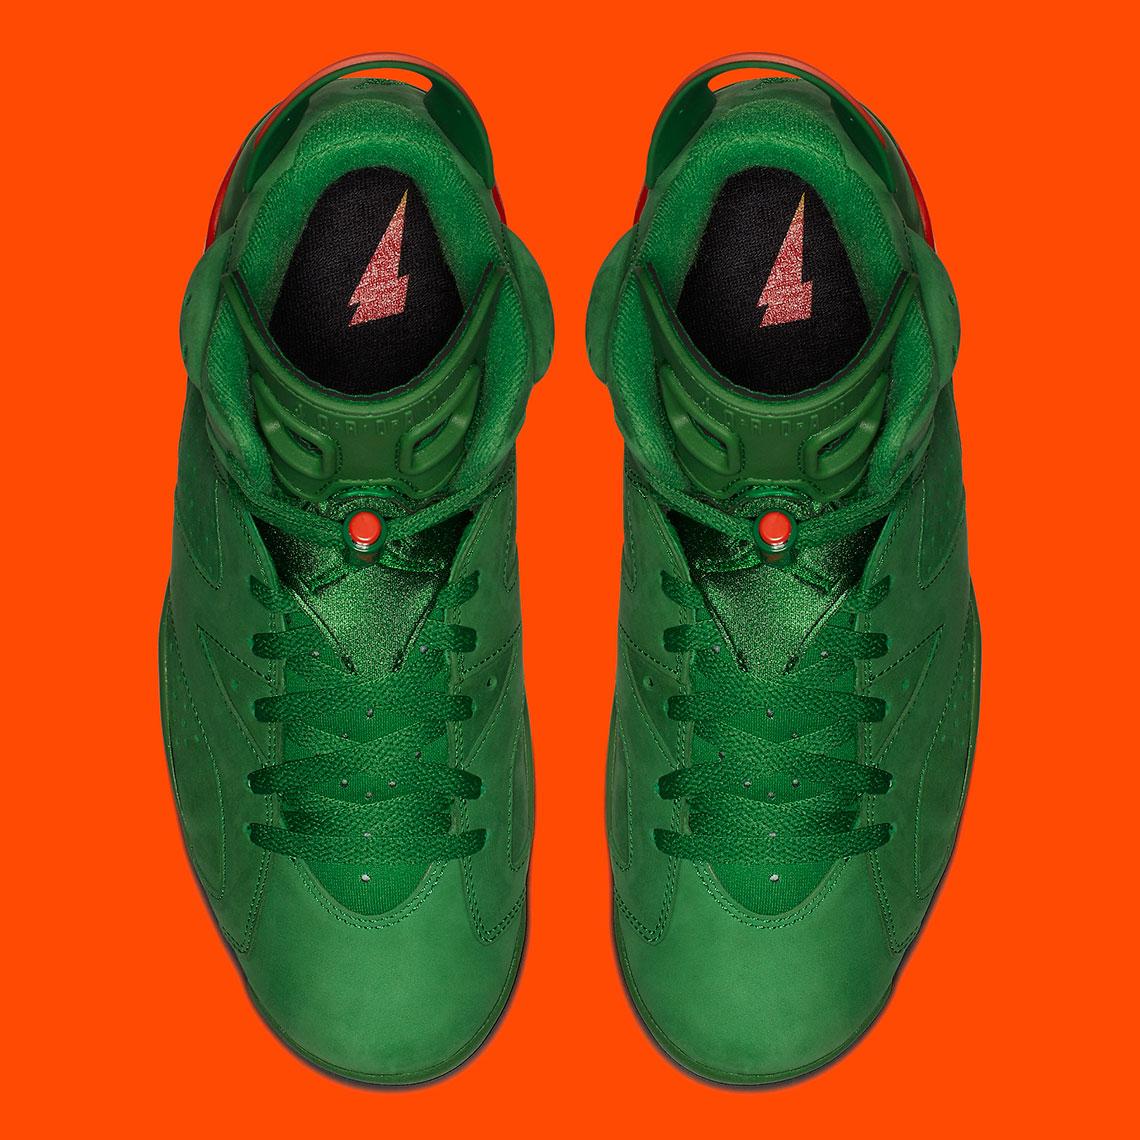 b8e3a7fd4347 Jordan 6 VI Gatorade Green Suede AJ5986-335 Release Info ...